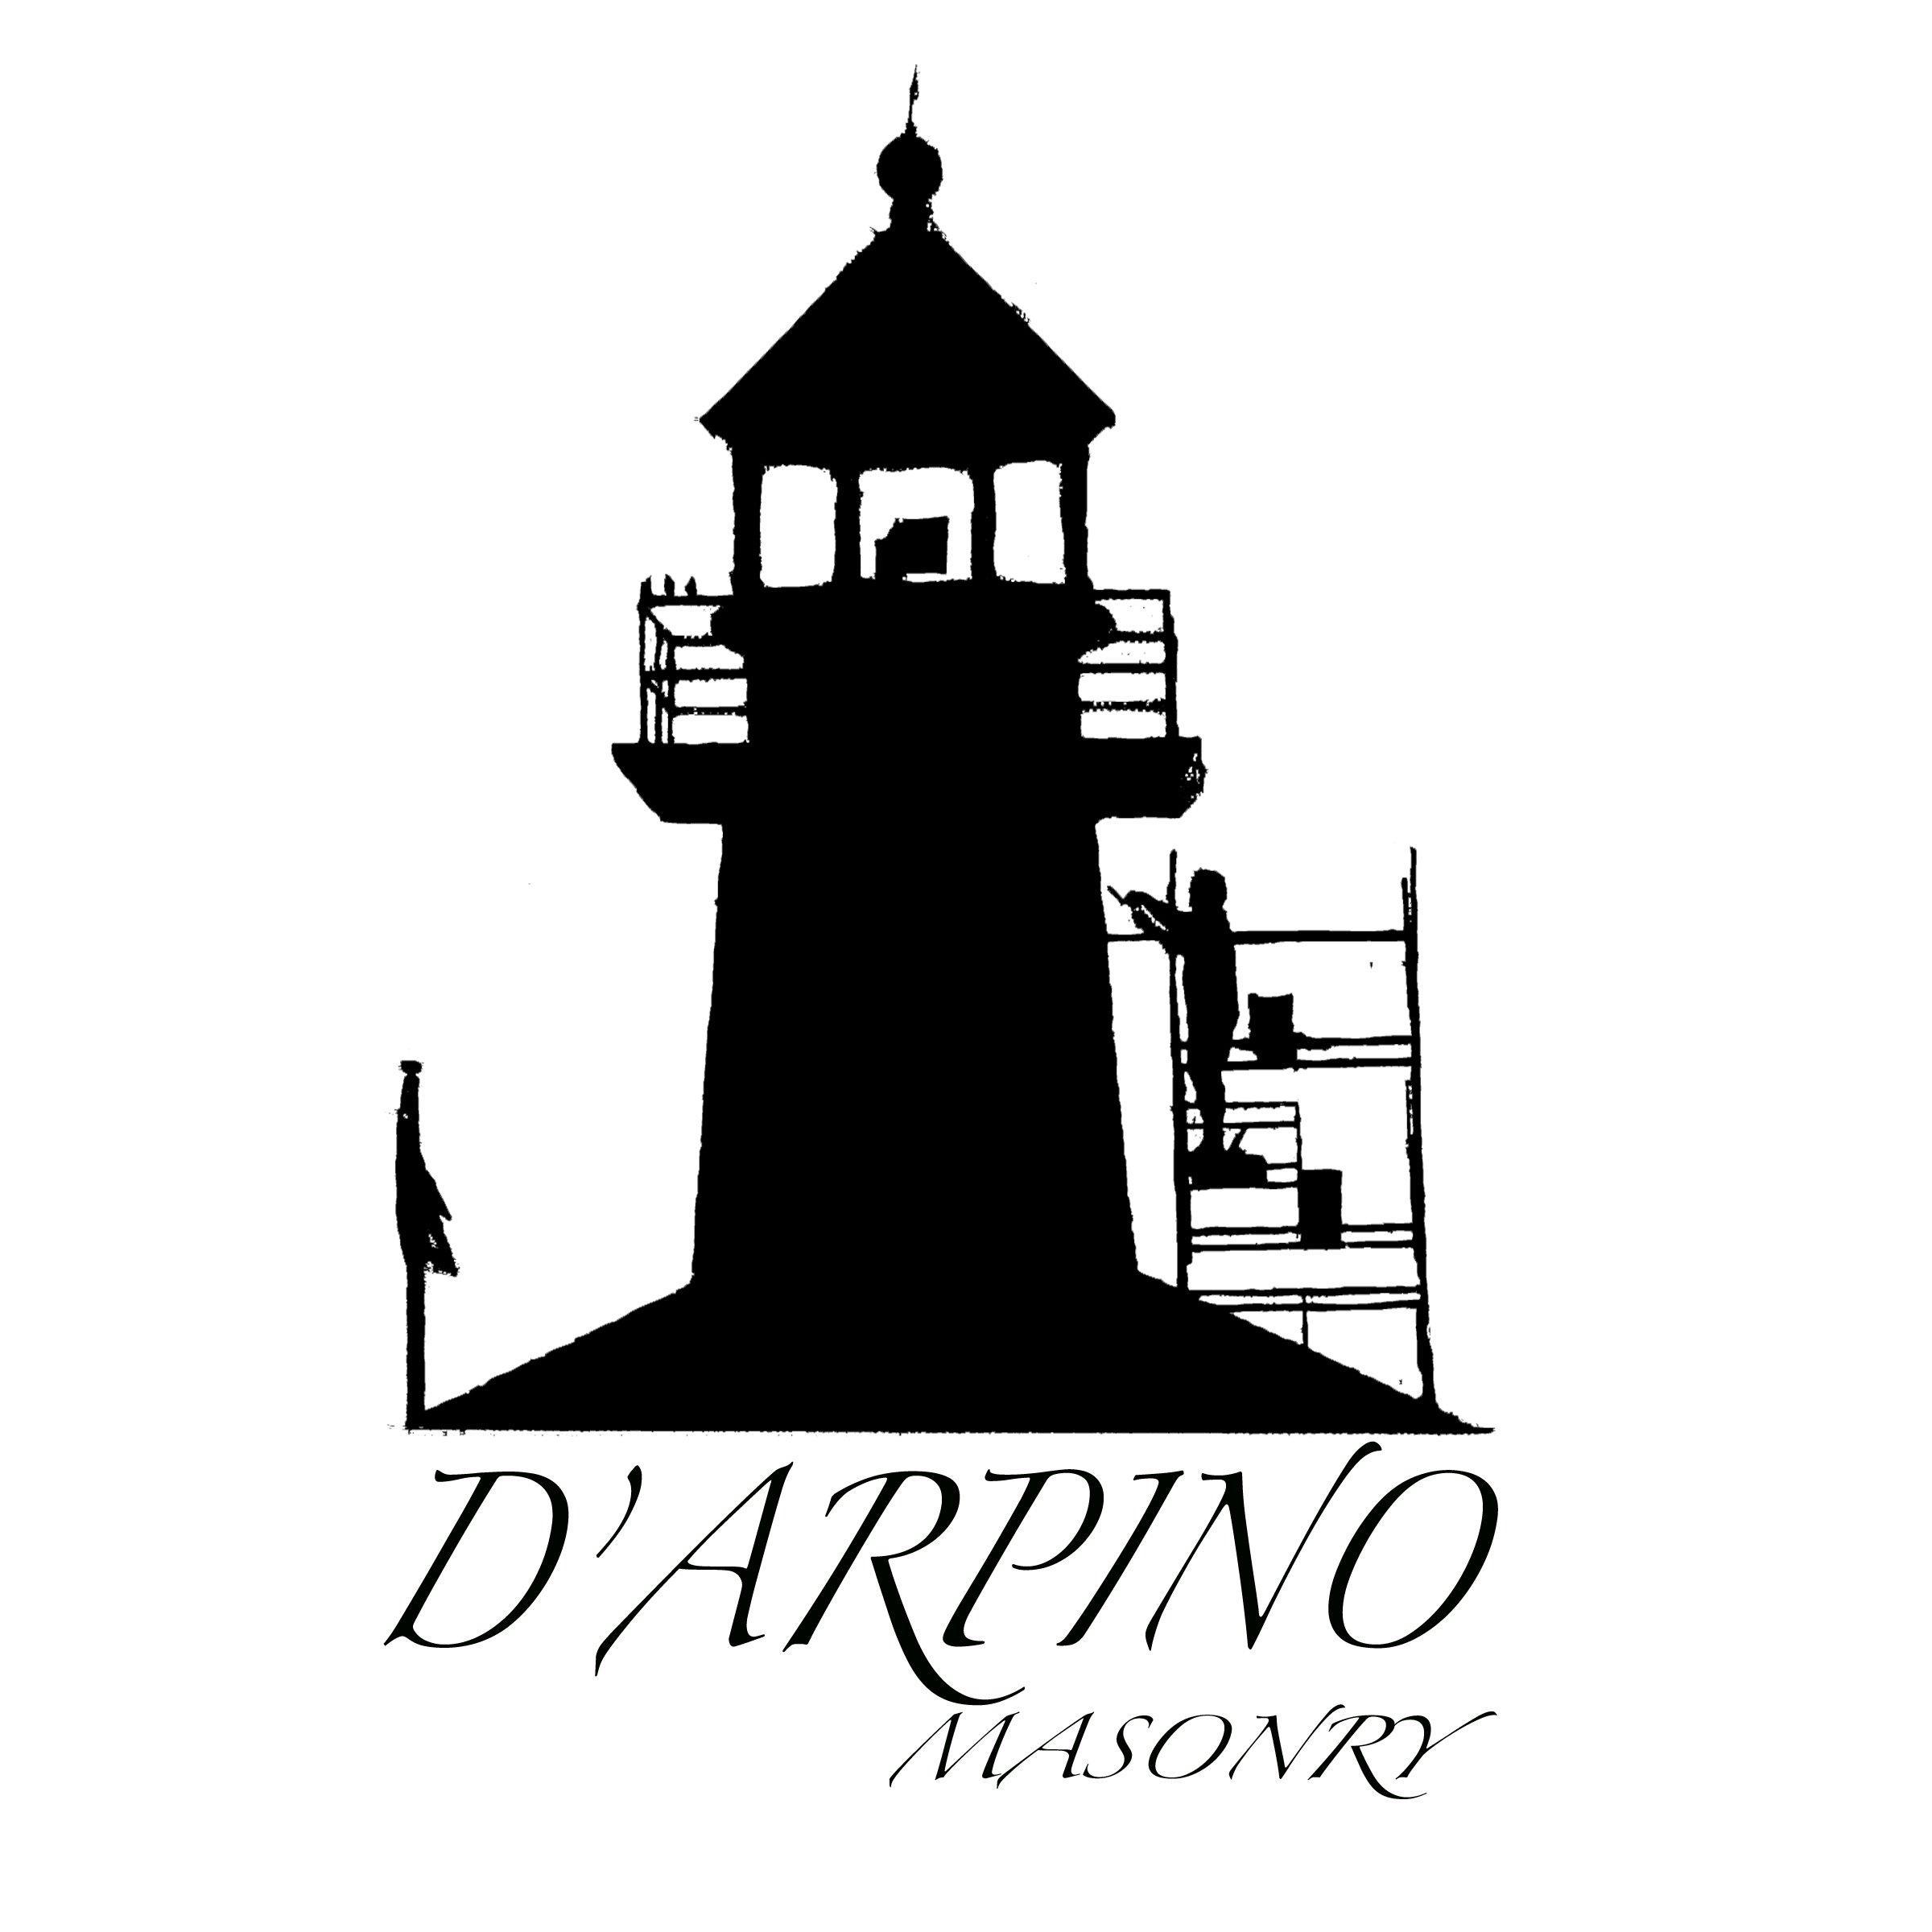 D'Arpino Masonry